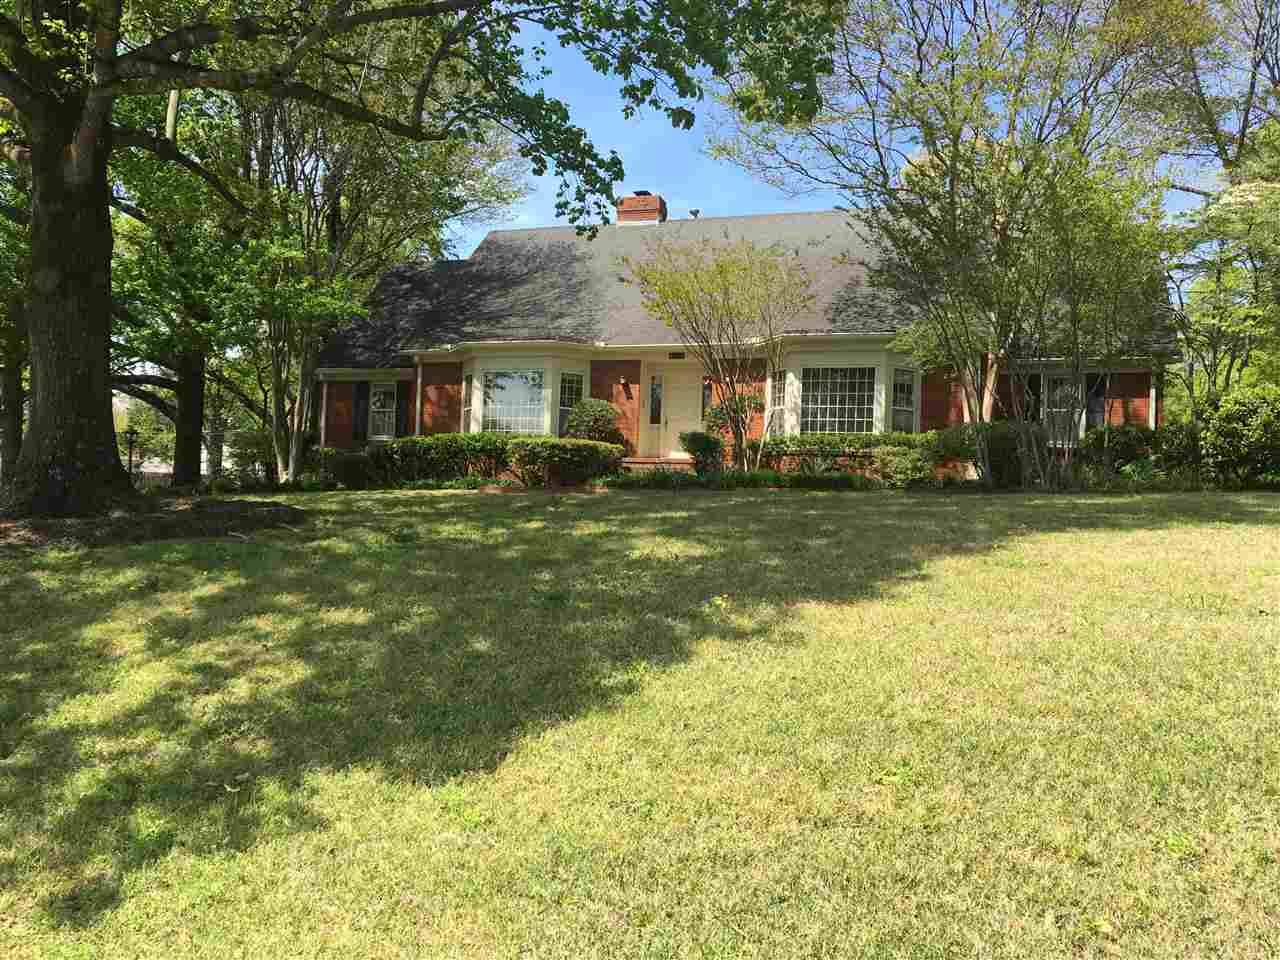 5360 Sycamore Grove, Memphis, TN 38120